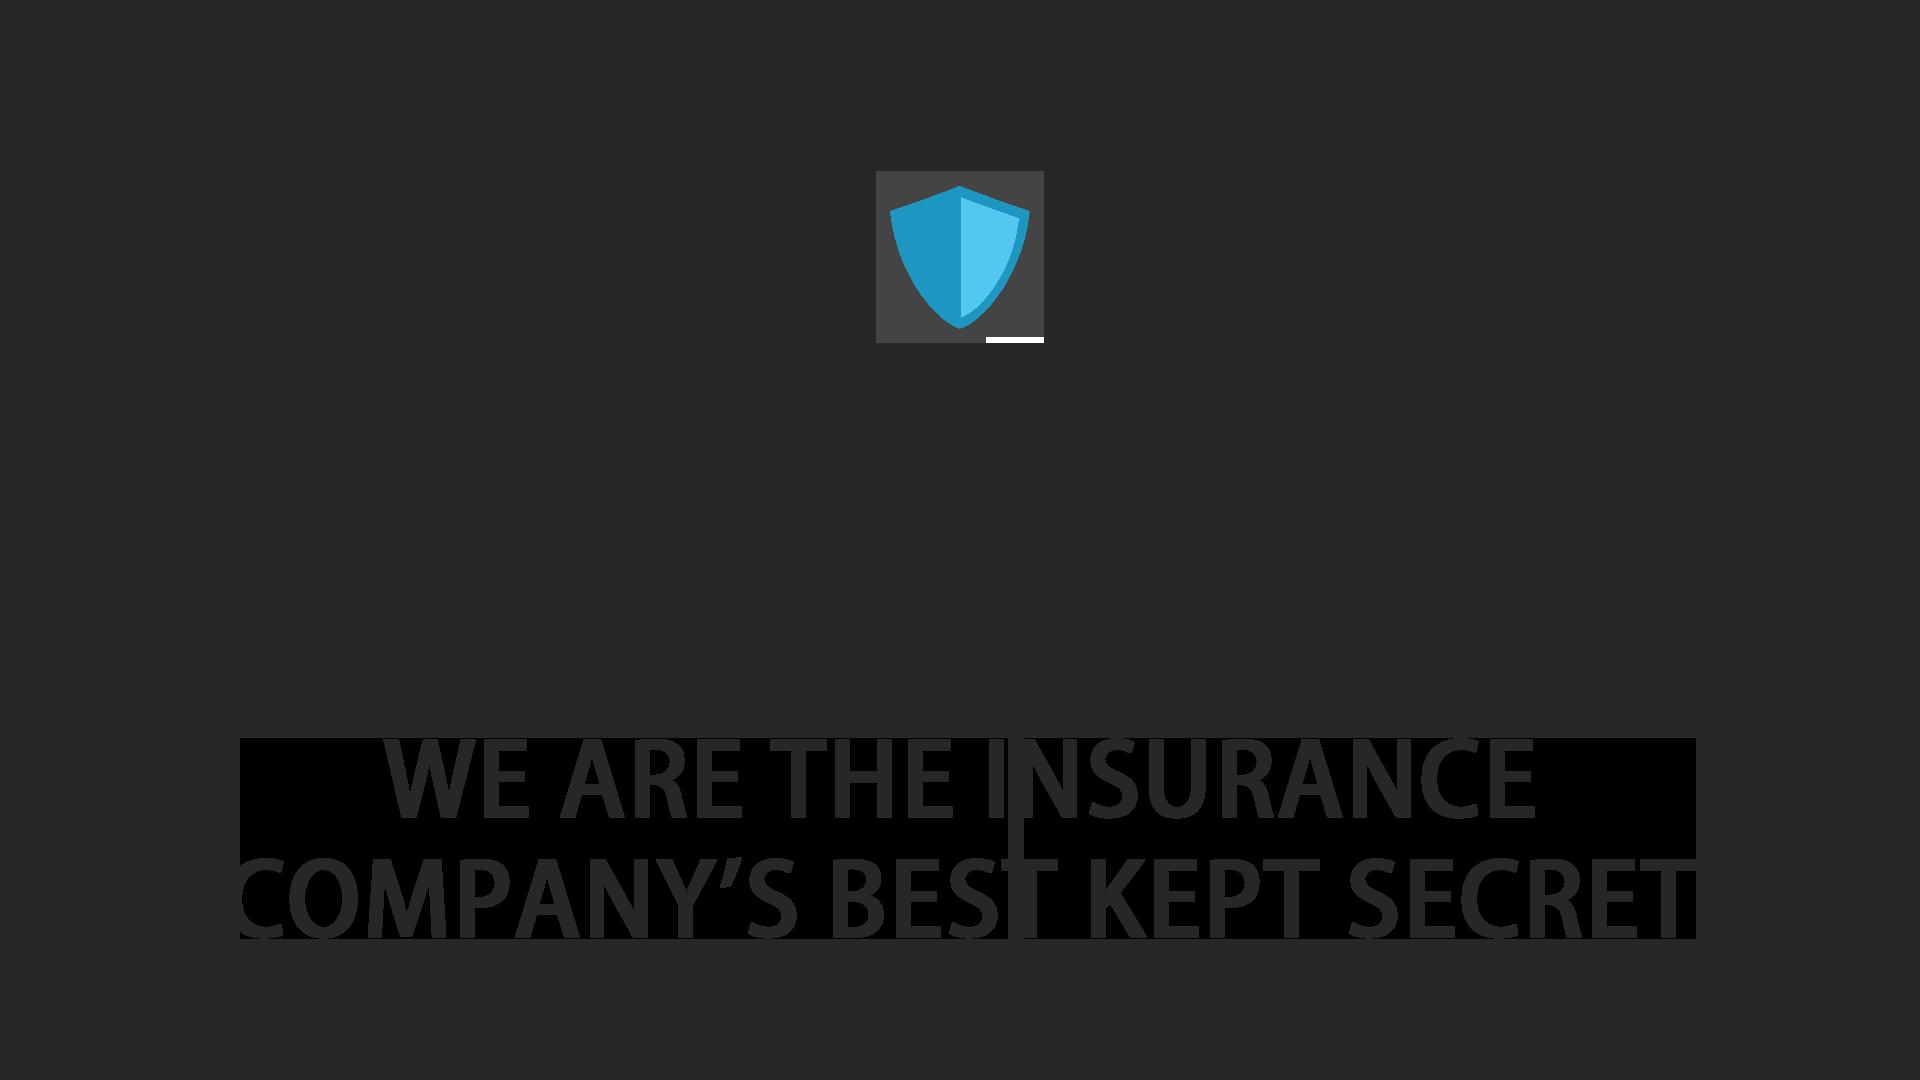 We Are the Insurance Company's Best Kept Secret